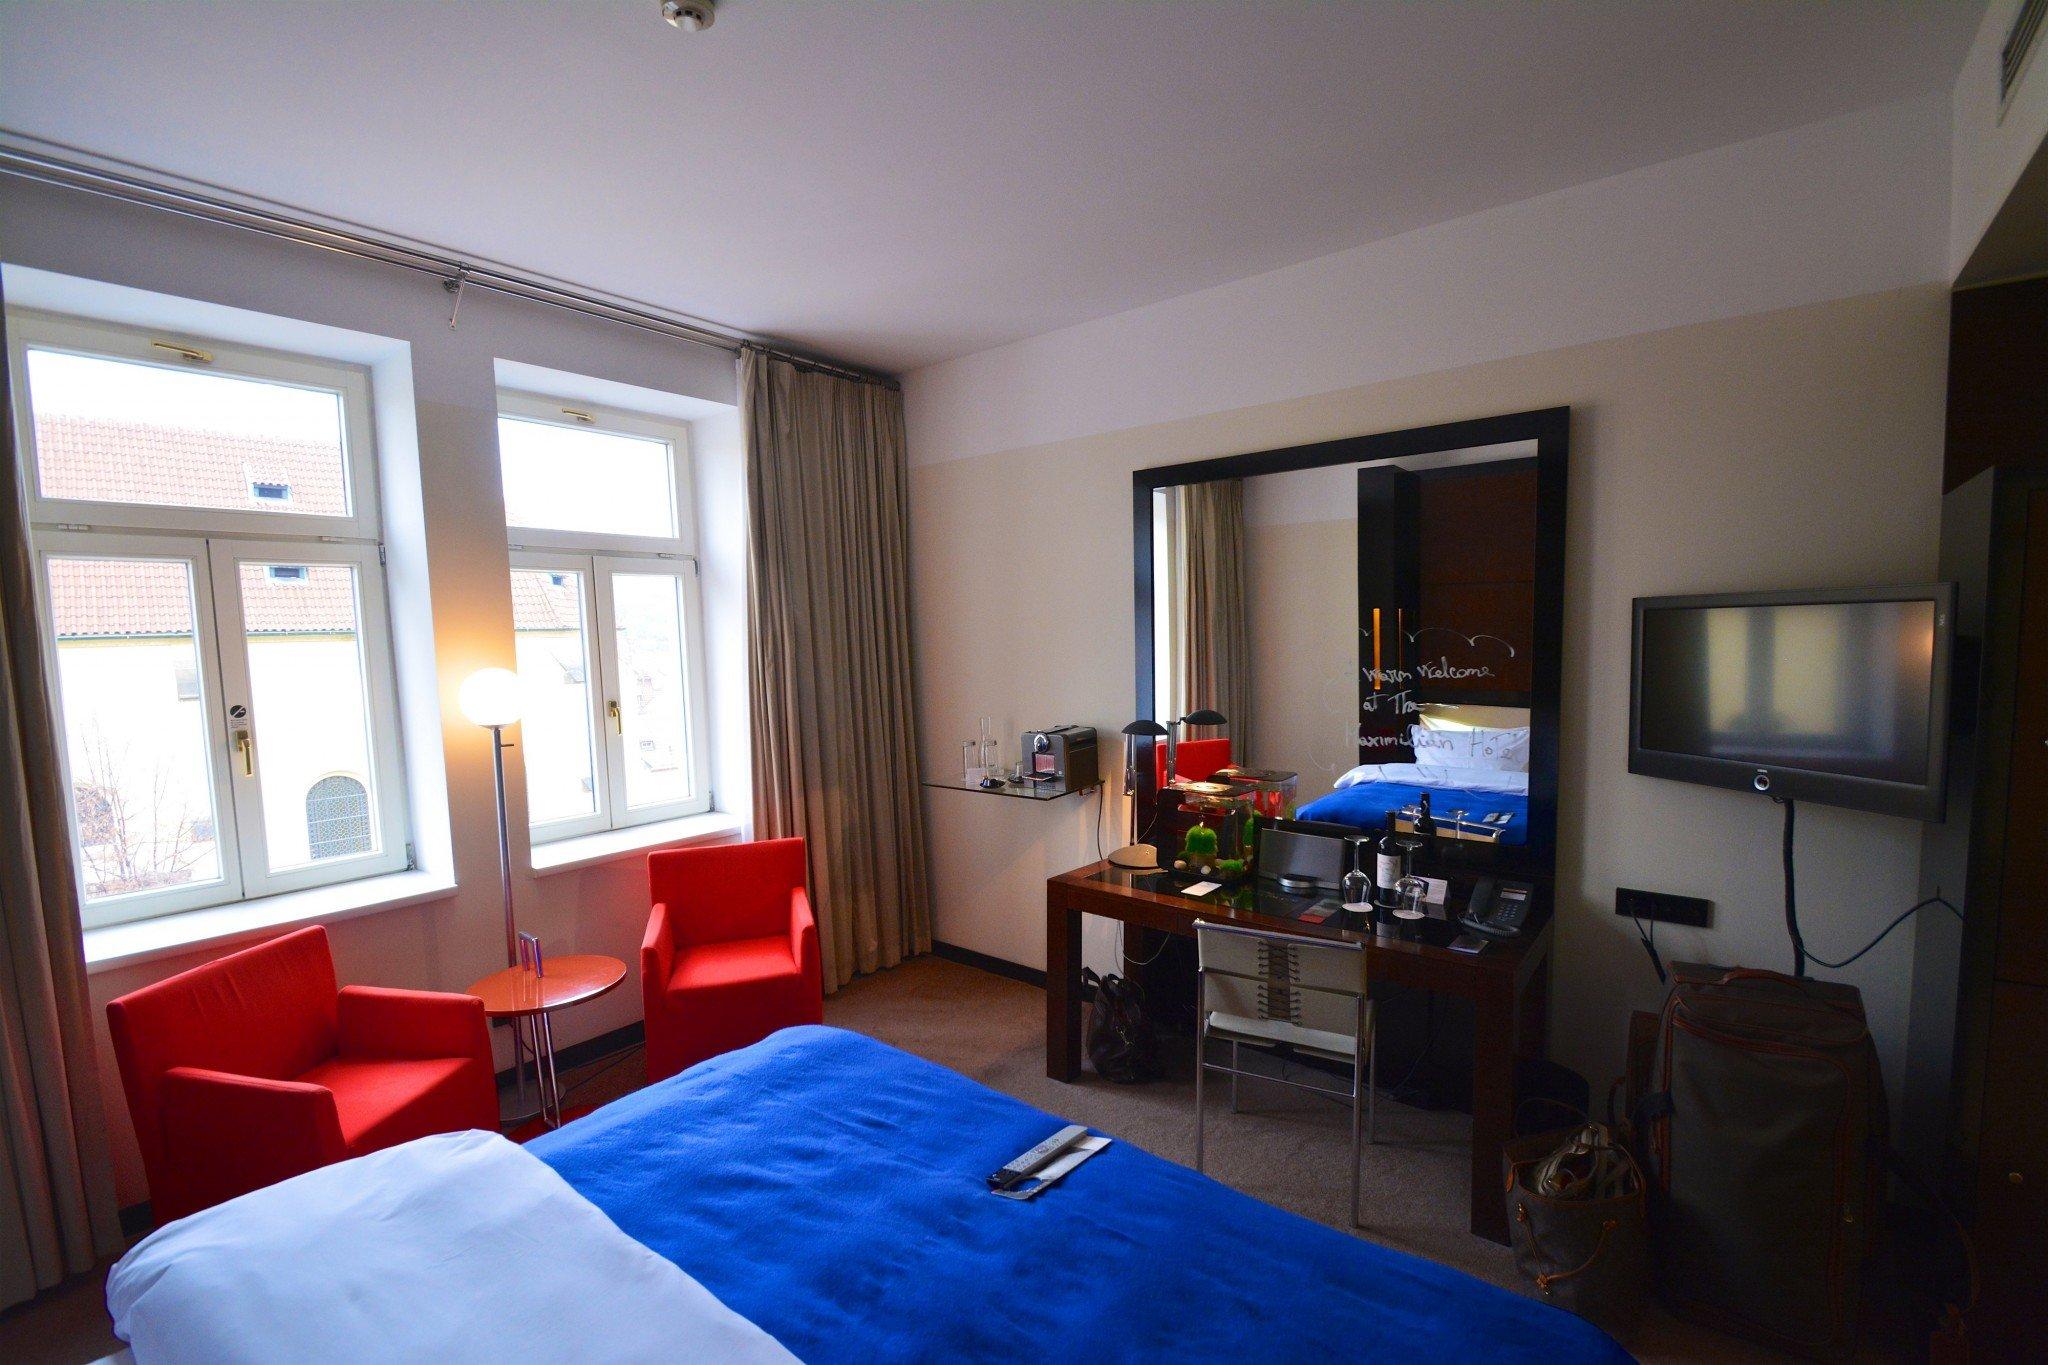 Hotel Maximilian room